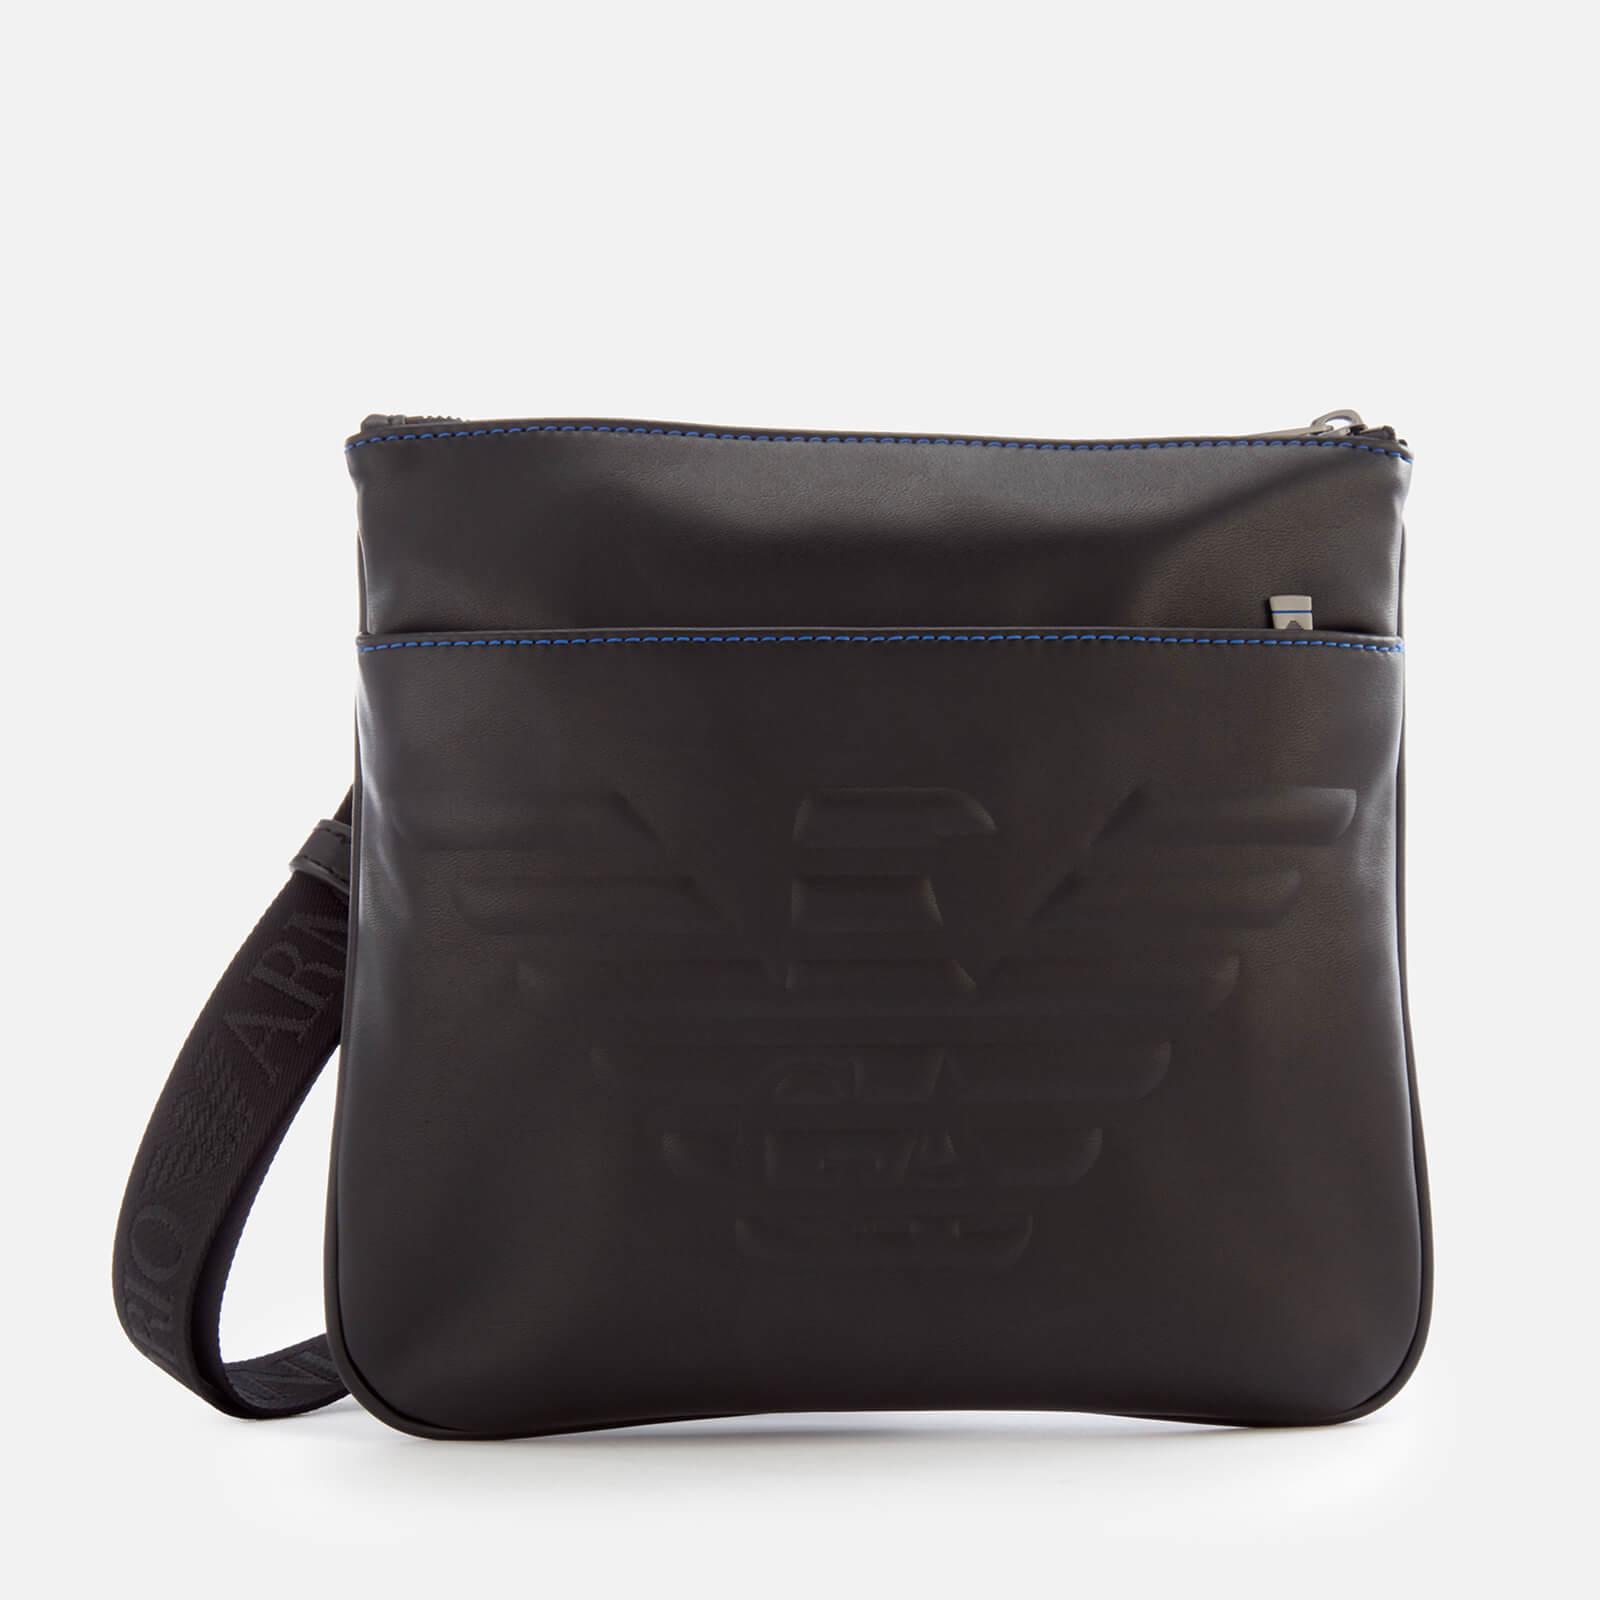 286022e3 Emporio Armani Men's Flat Messenger Bag - Black